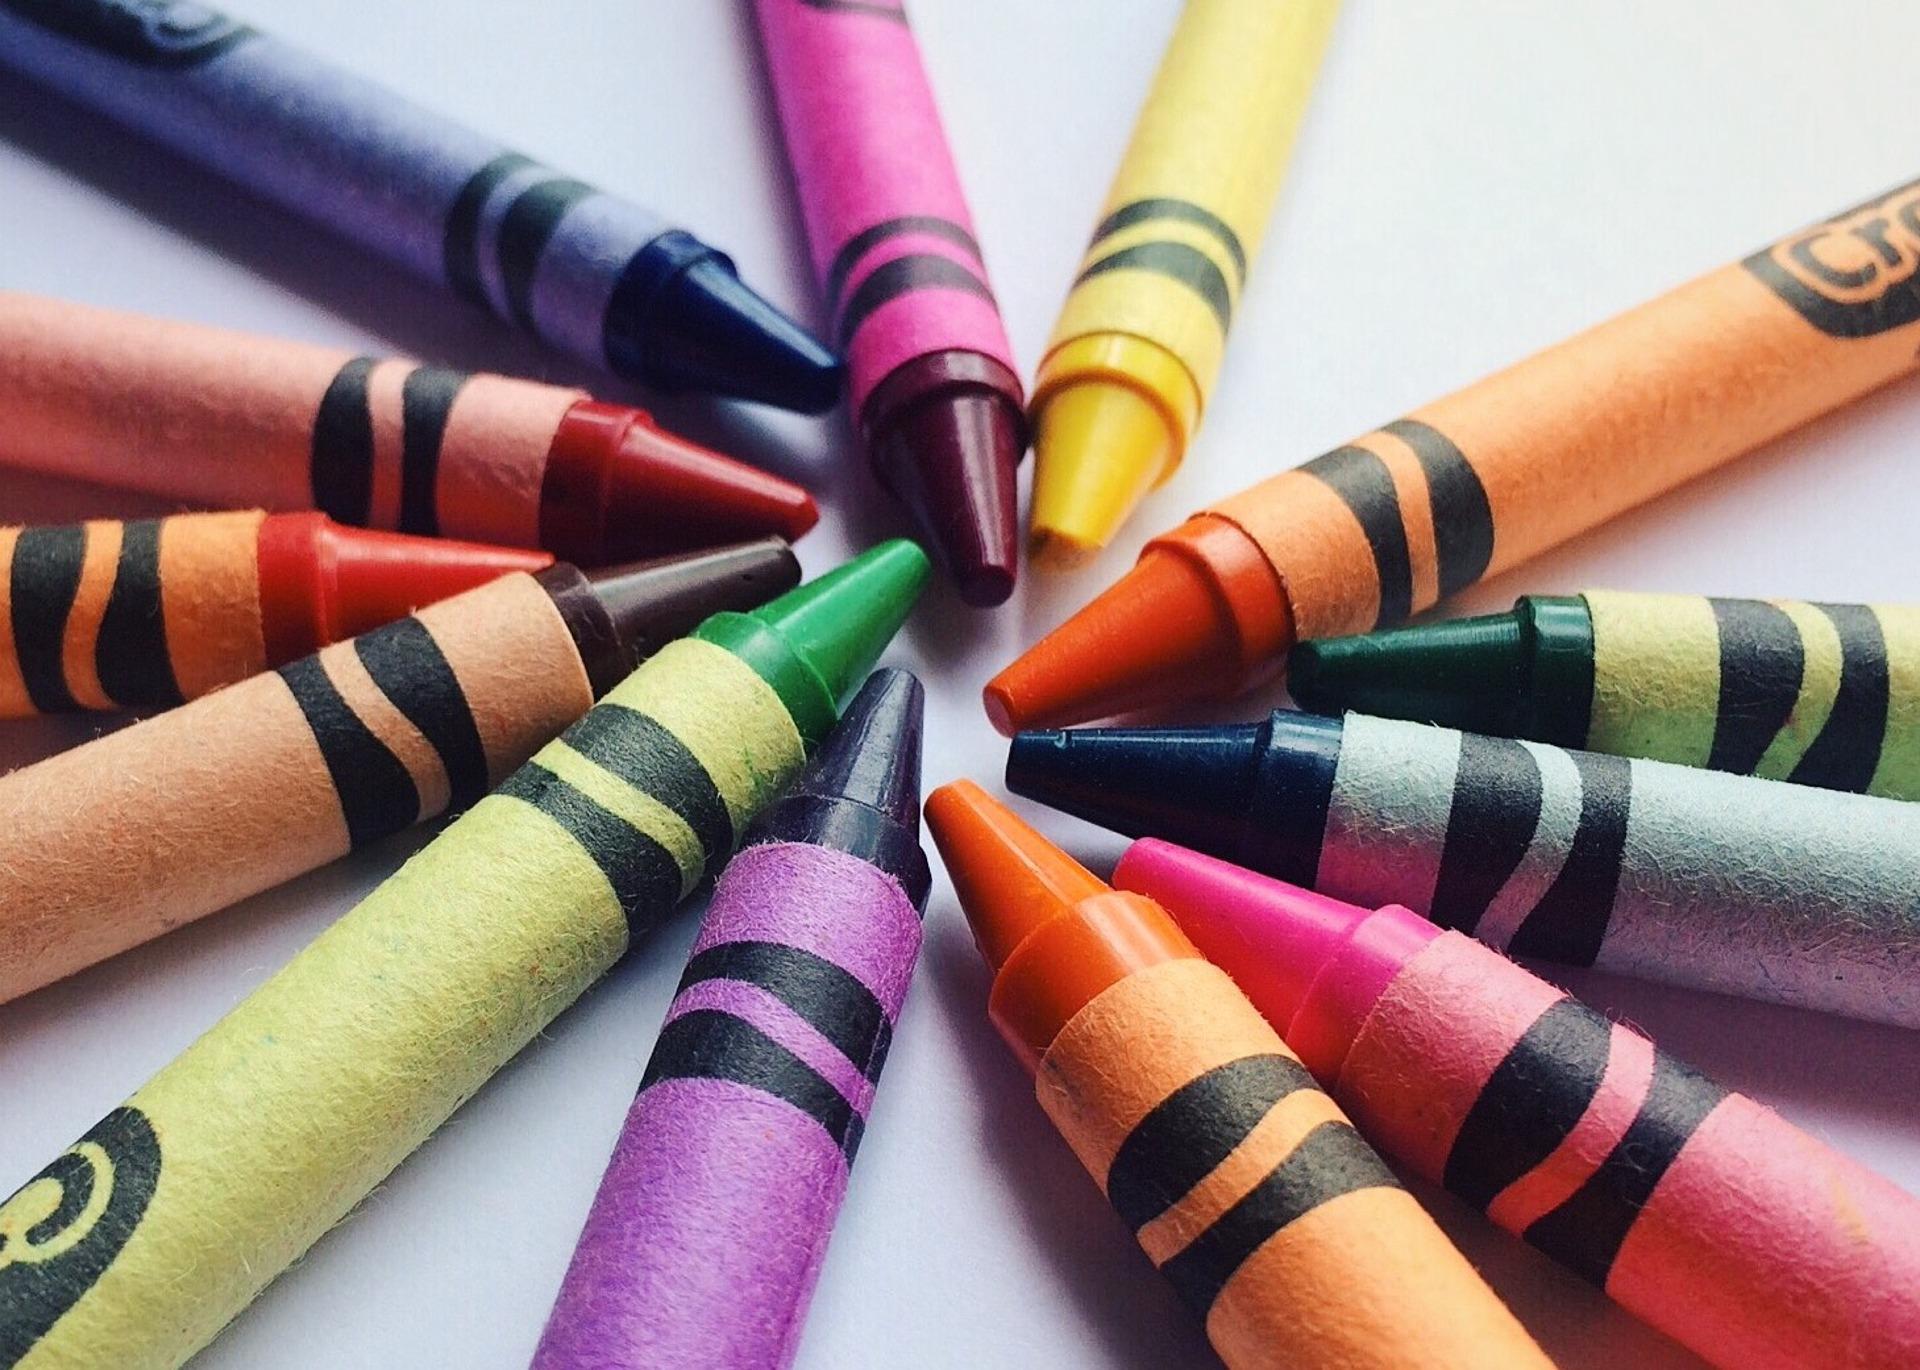 crayons-2663935_1920